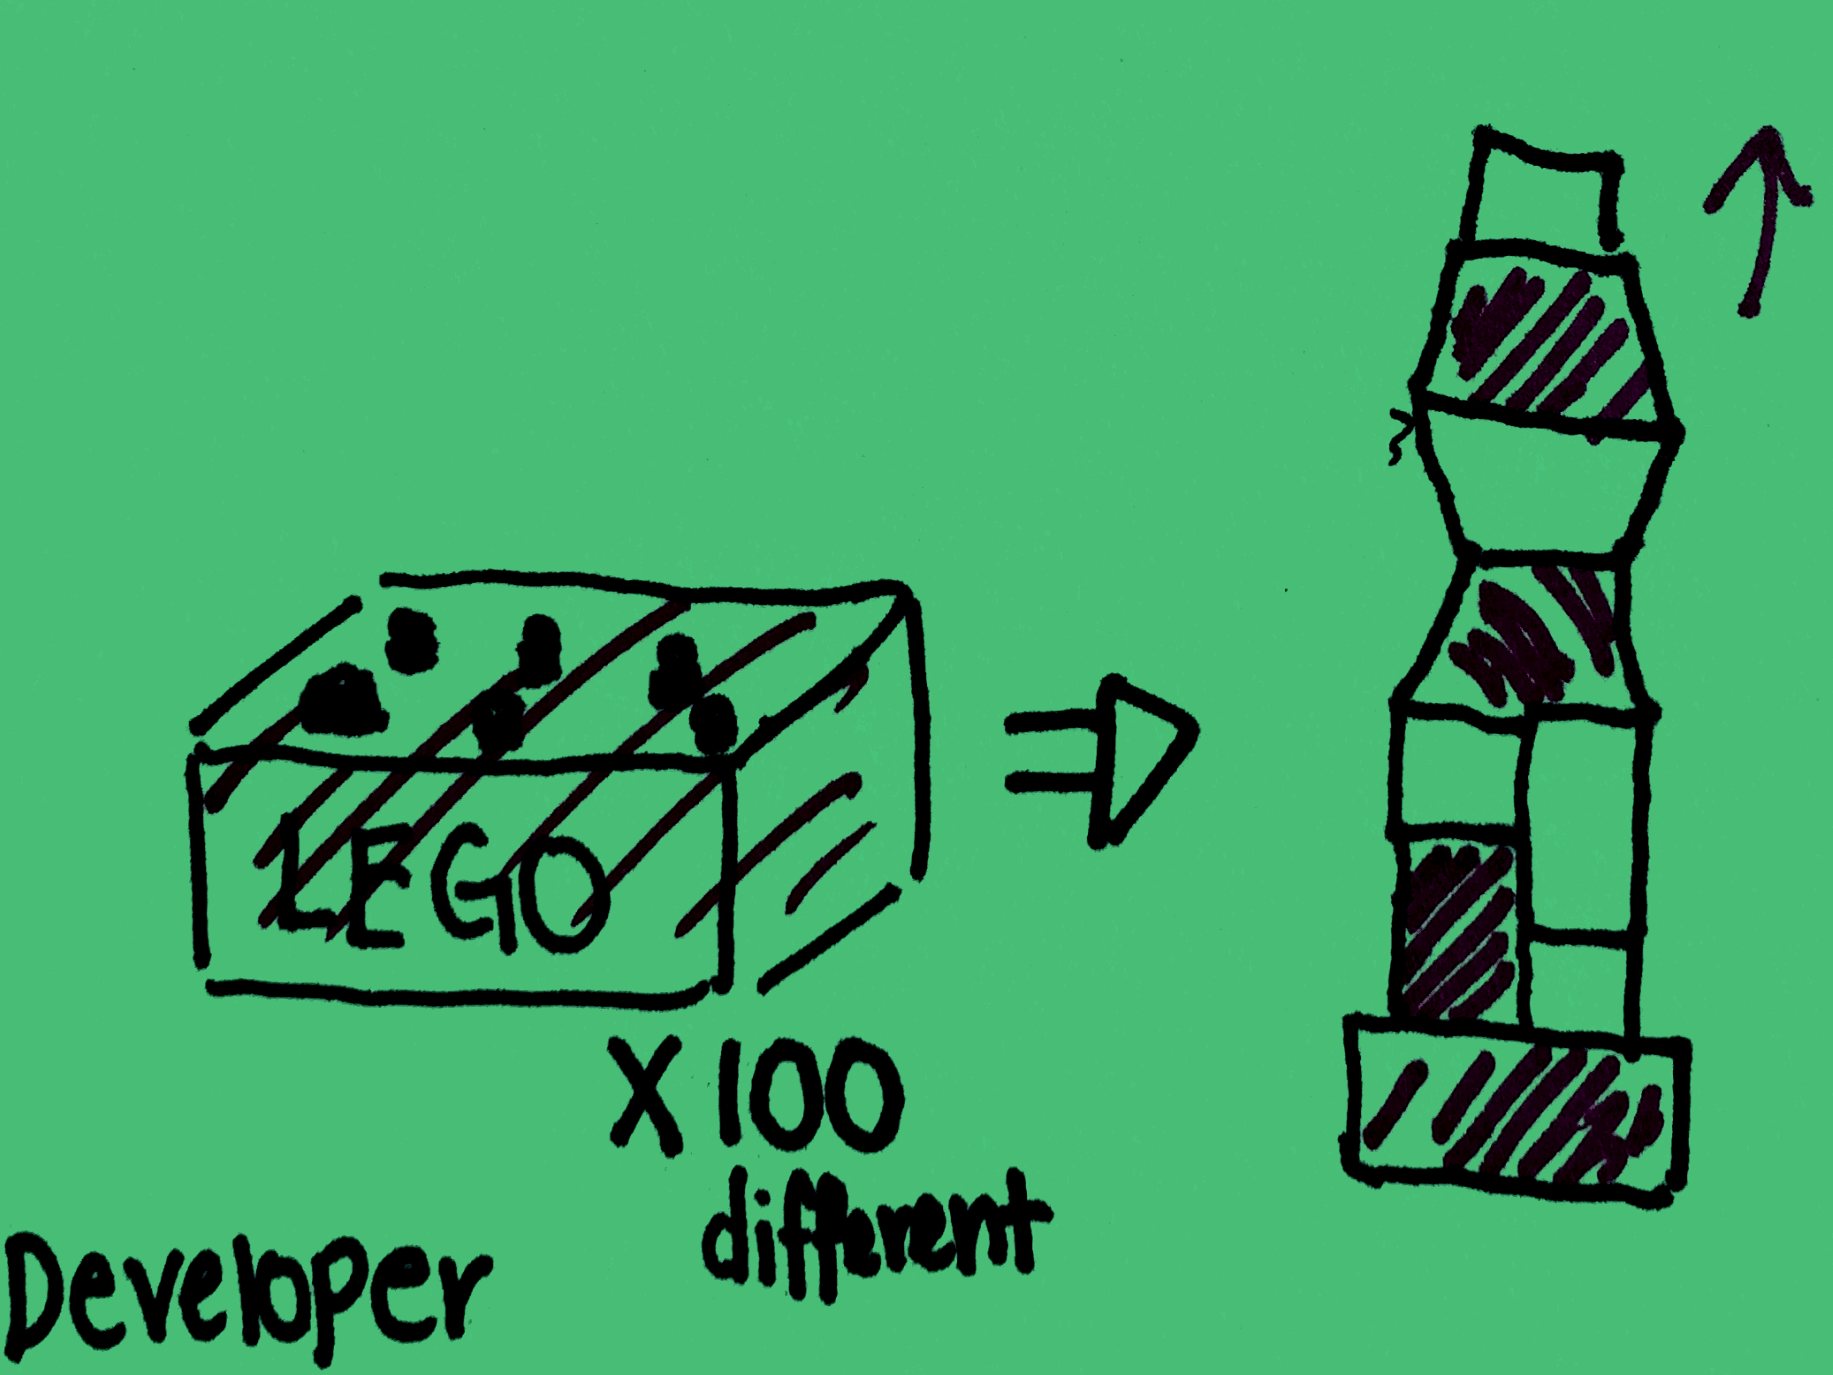 Developer Strengthsfinder Building Lego Blocks